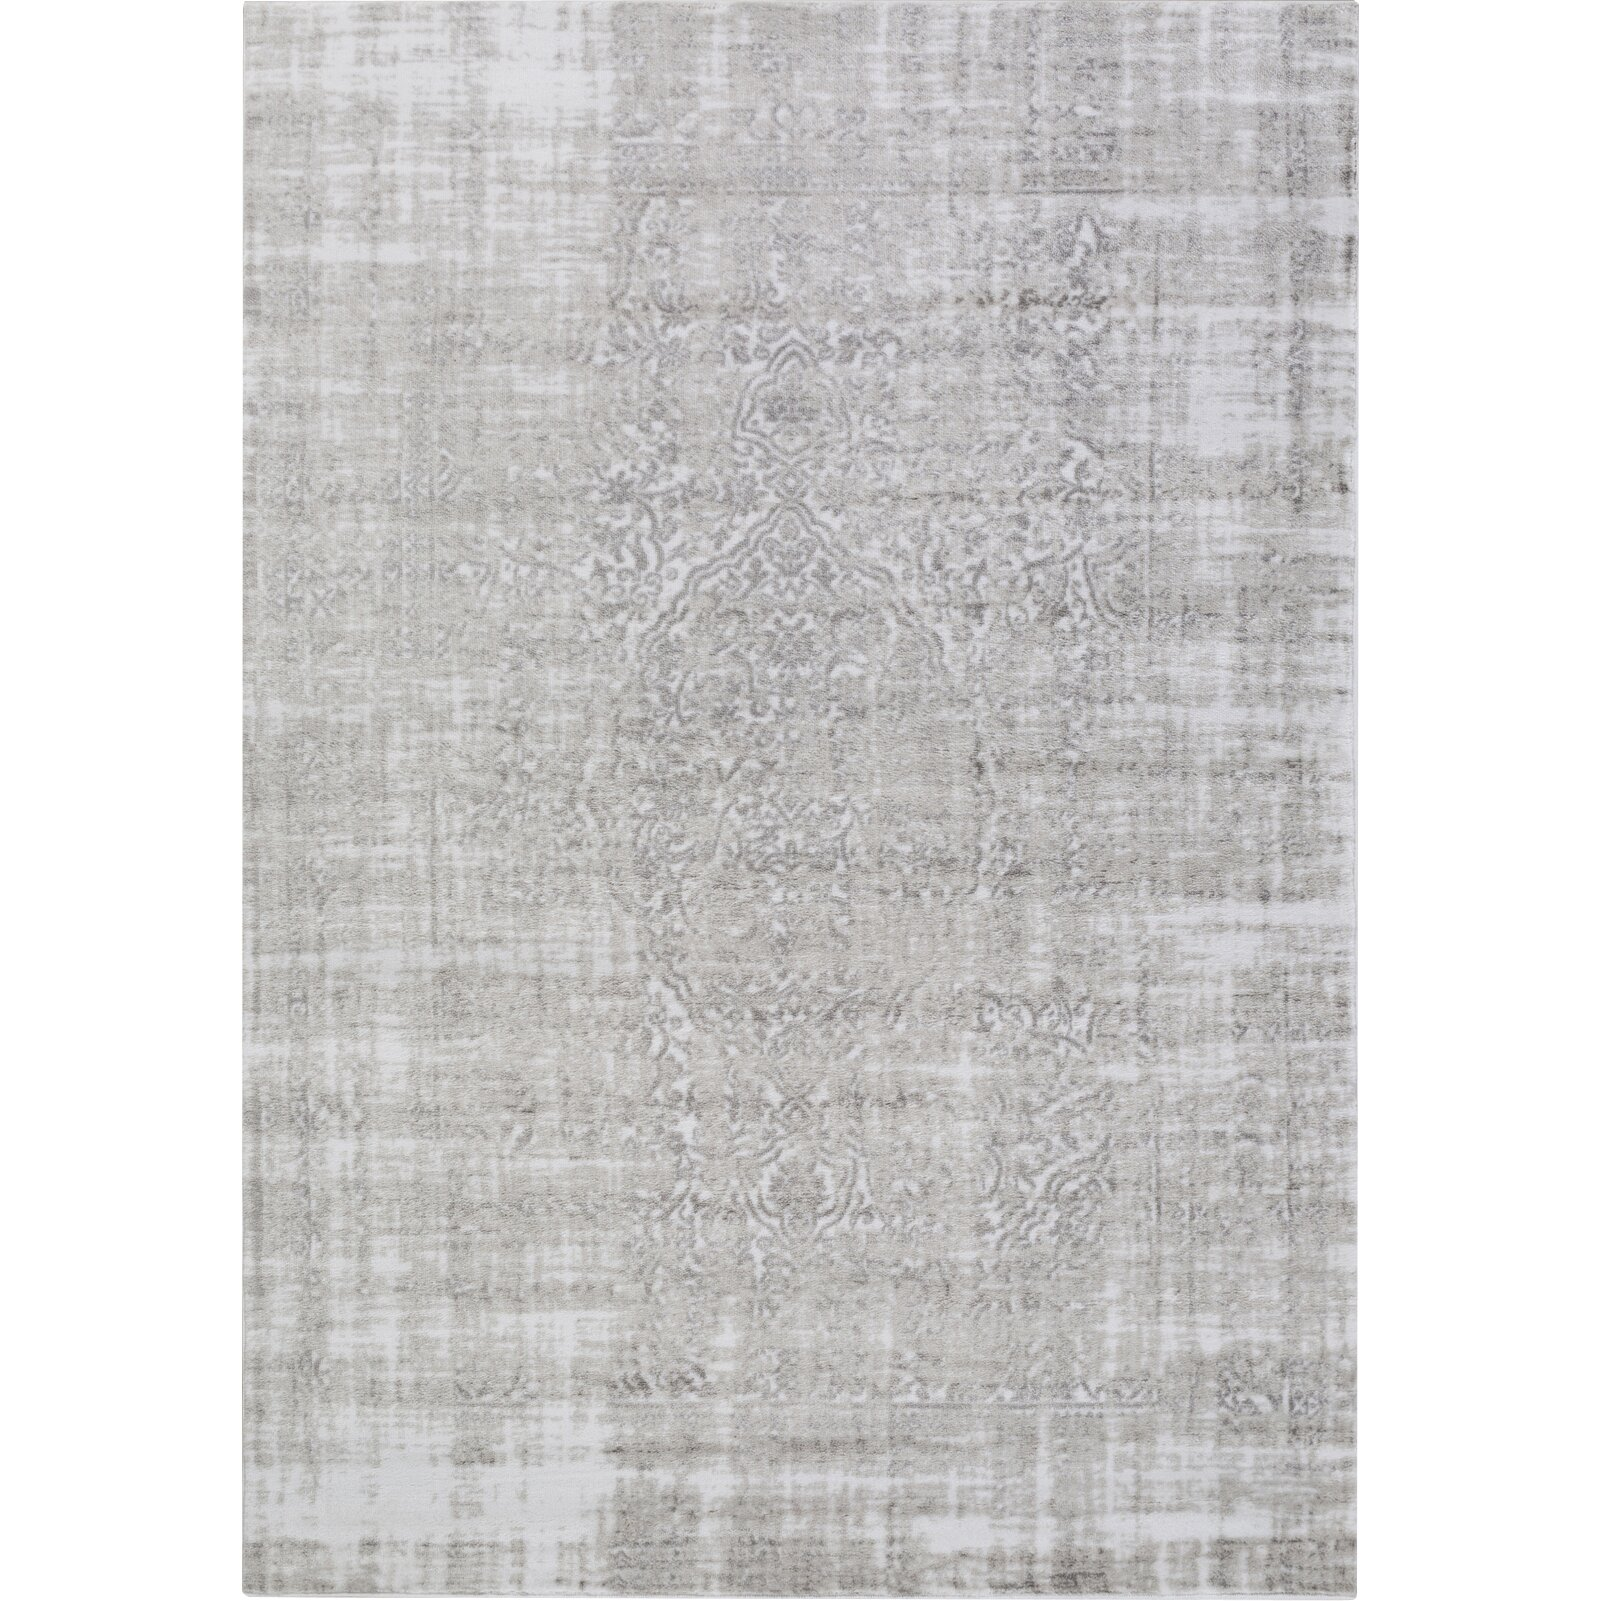 lark manor ismay ivorymedium gray area rug  reviews  wayfair supply - ismay ivorymedium gray area rug